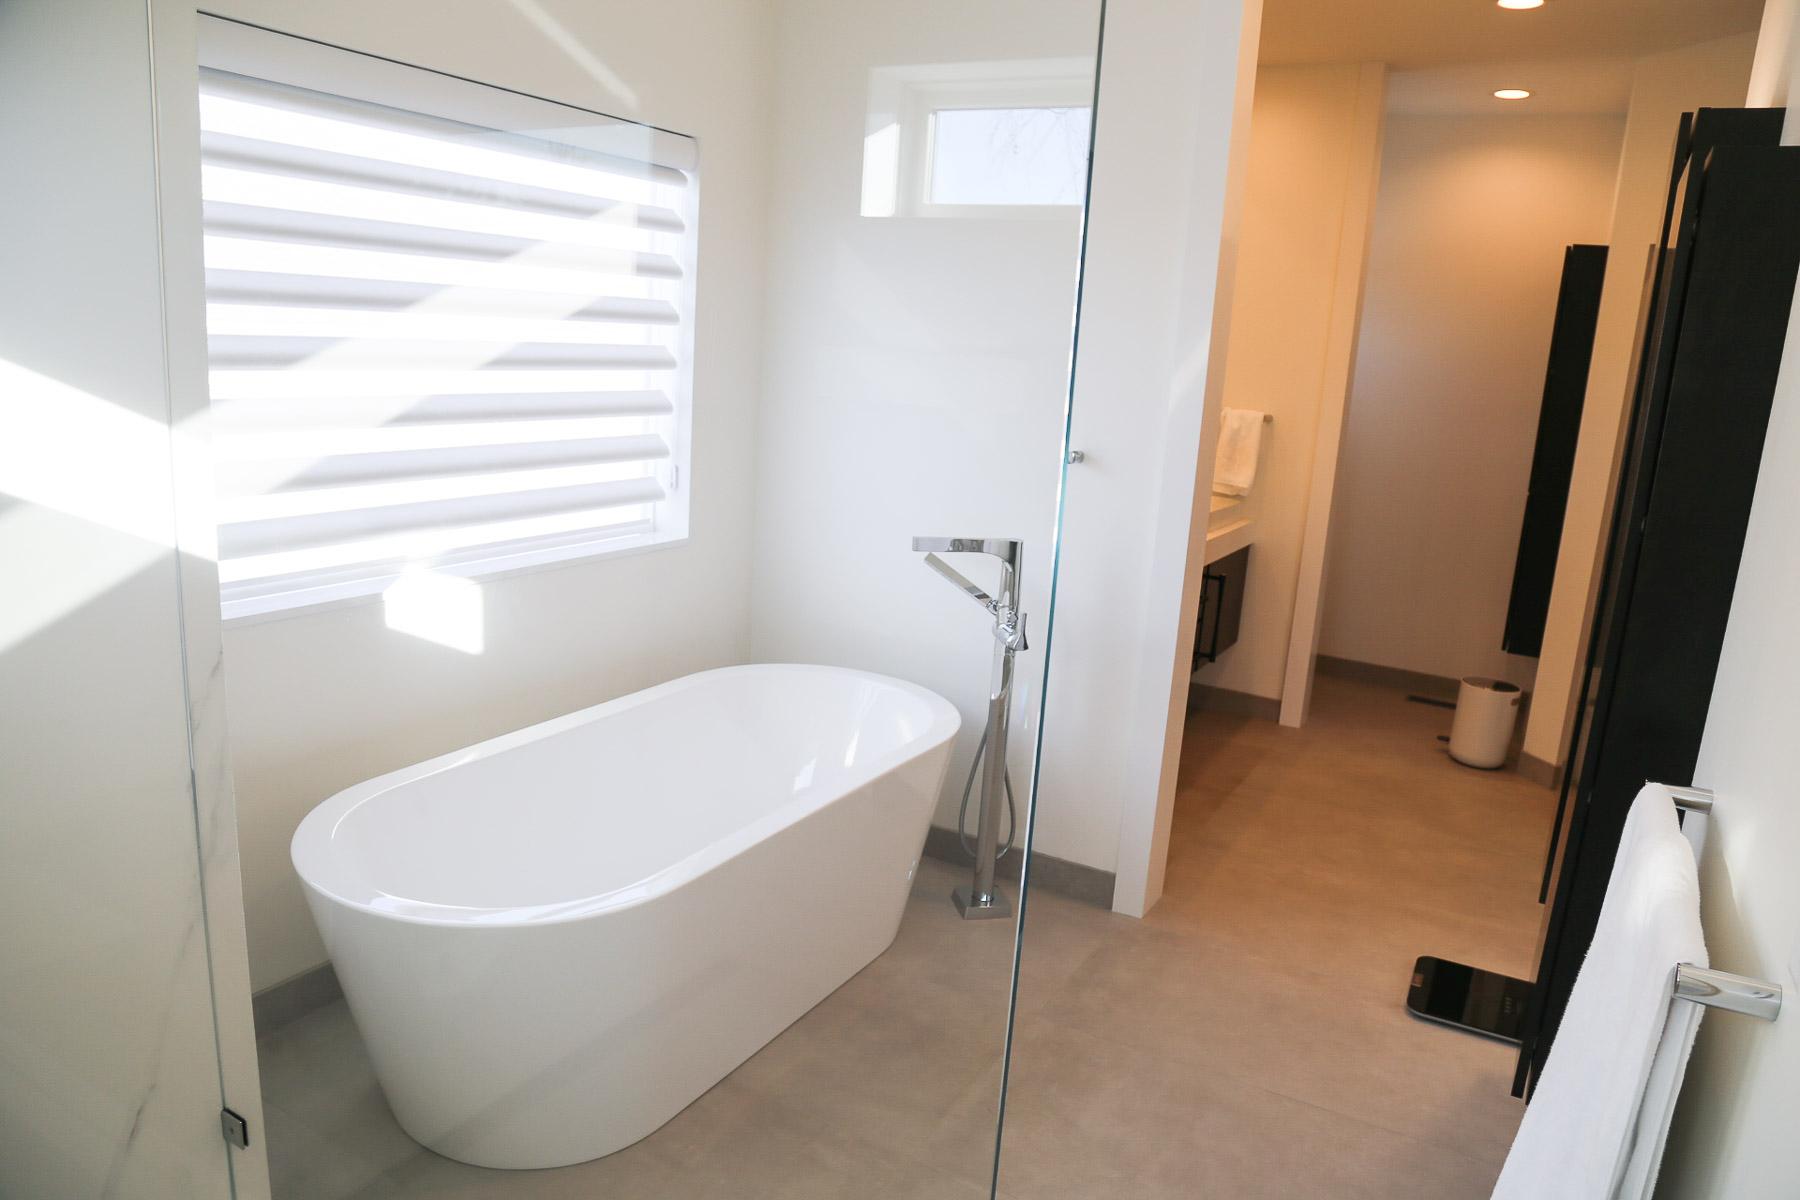 Bathroom-3.JPG